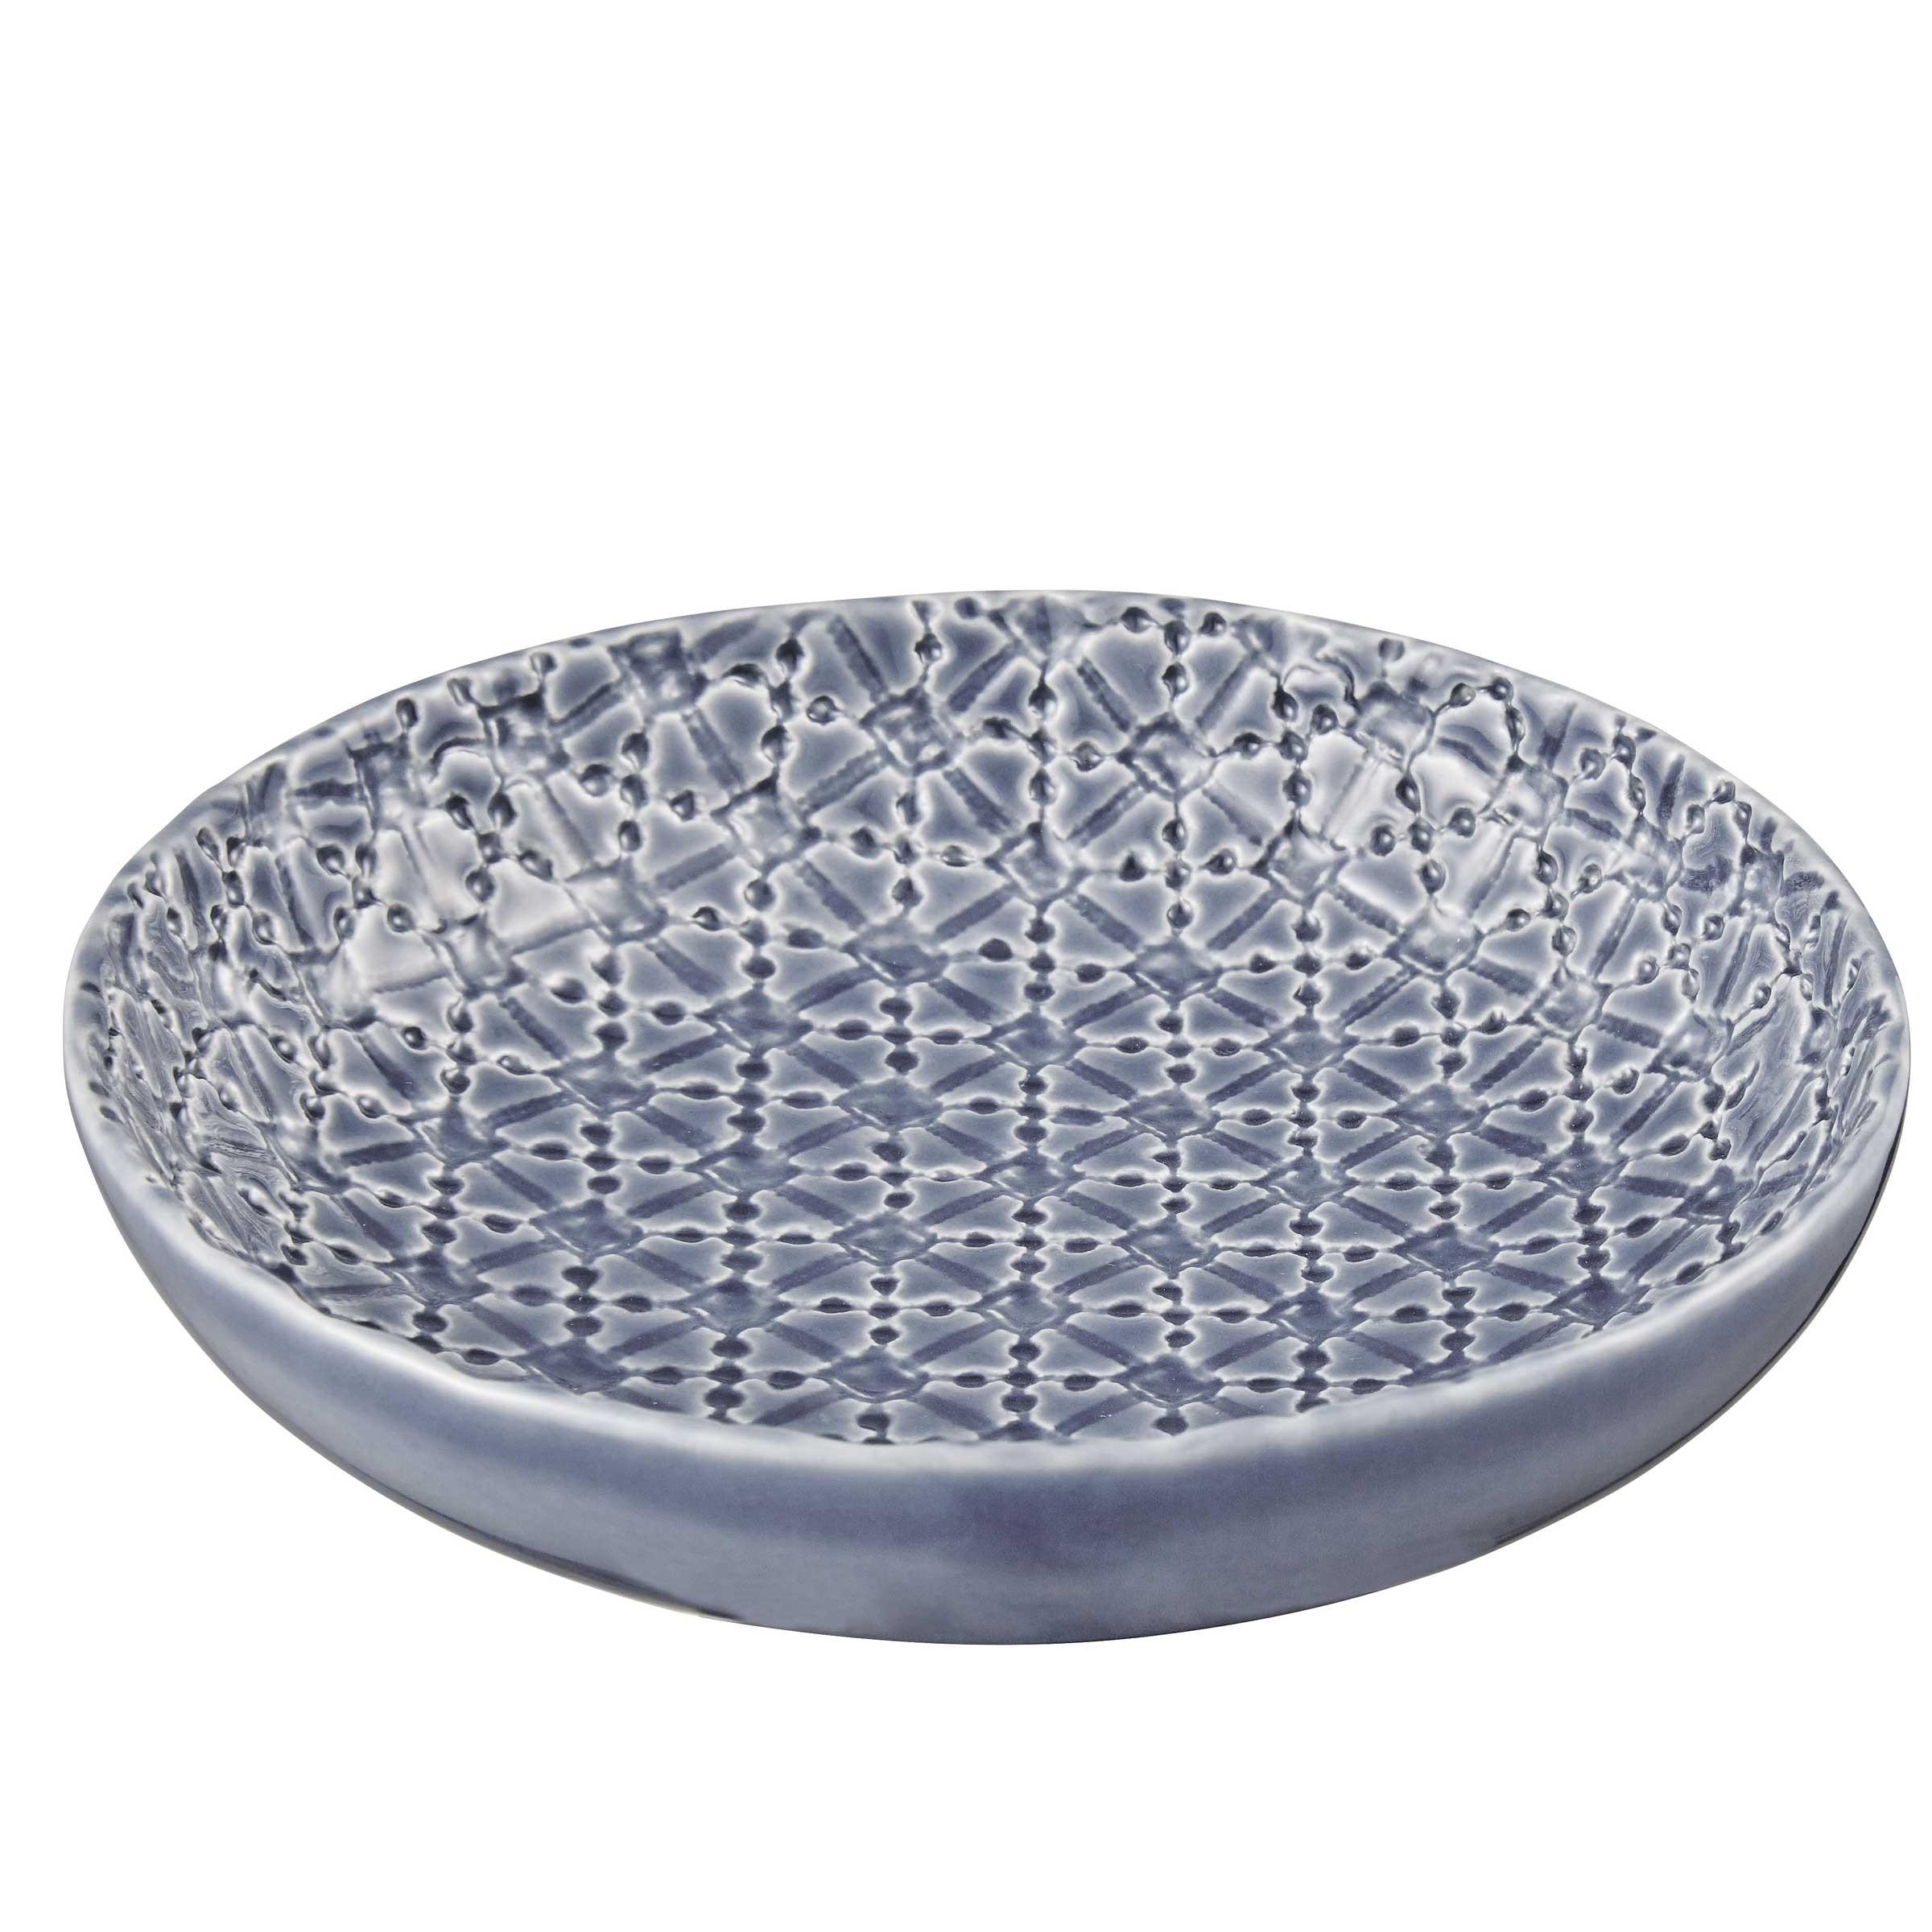 pasta-bowl_2.jpg